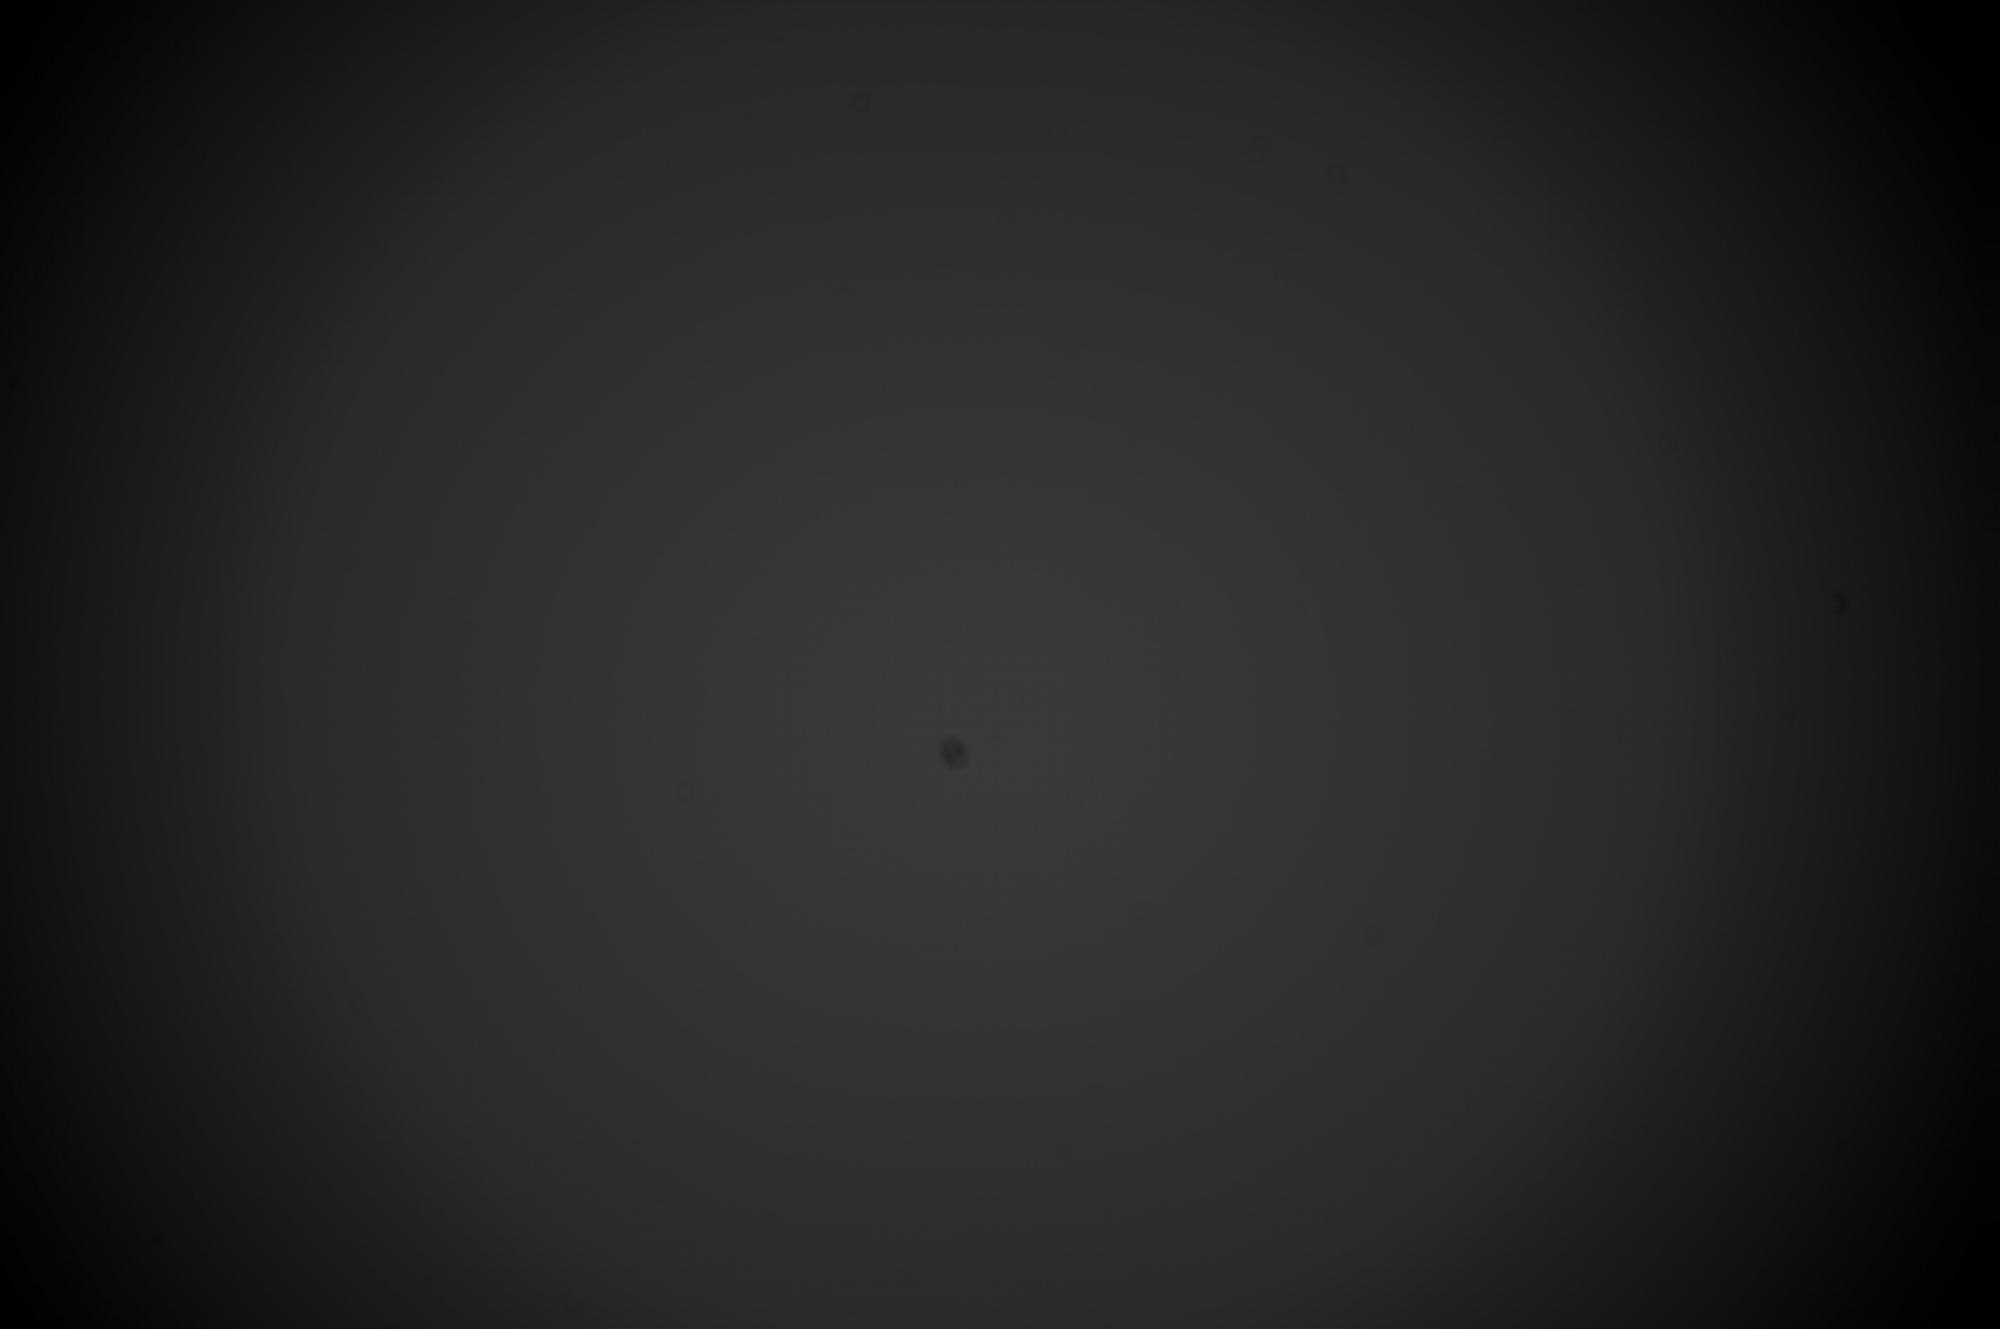 masterflatjpg.thumb.jpg.6594cd2cc0828e81b24c0b0d34421fa8.jpg